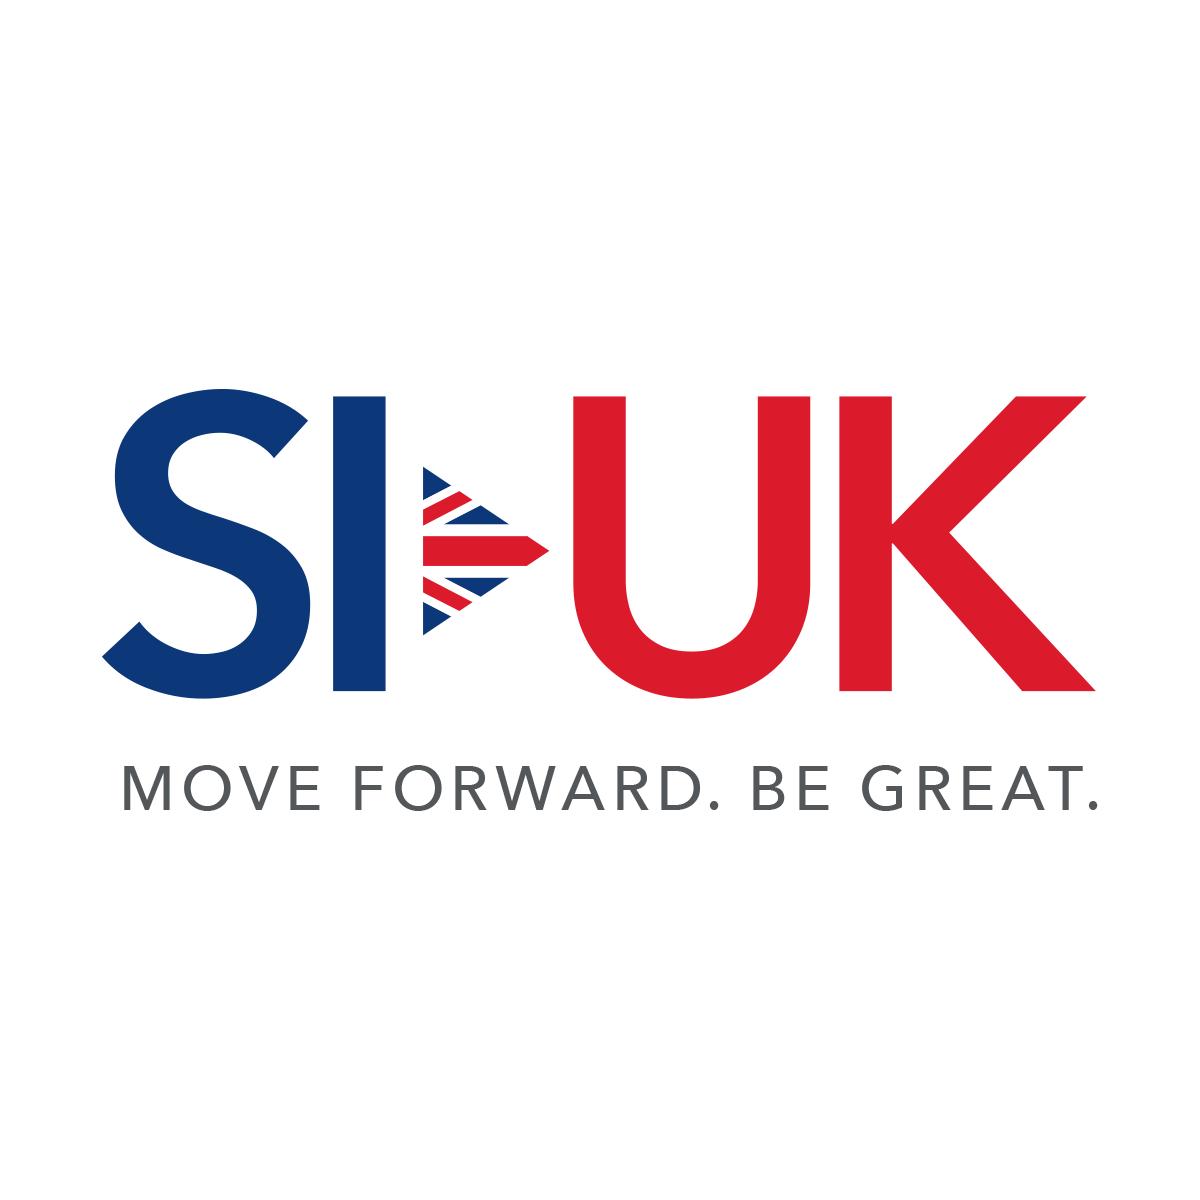 www.studyin-uk.com